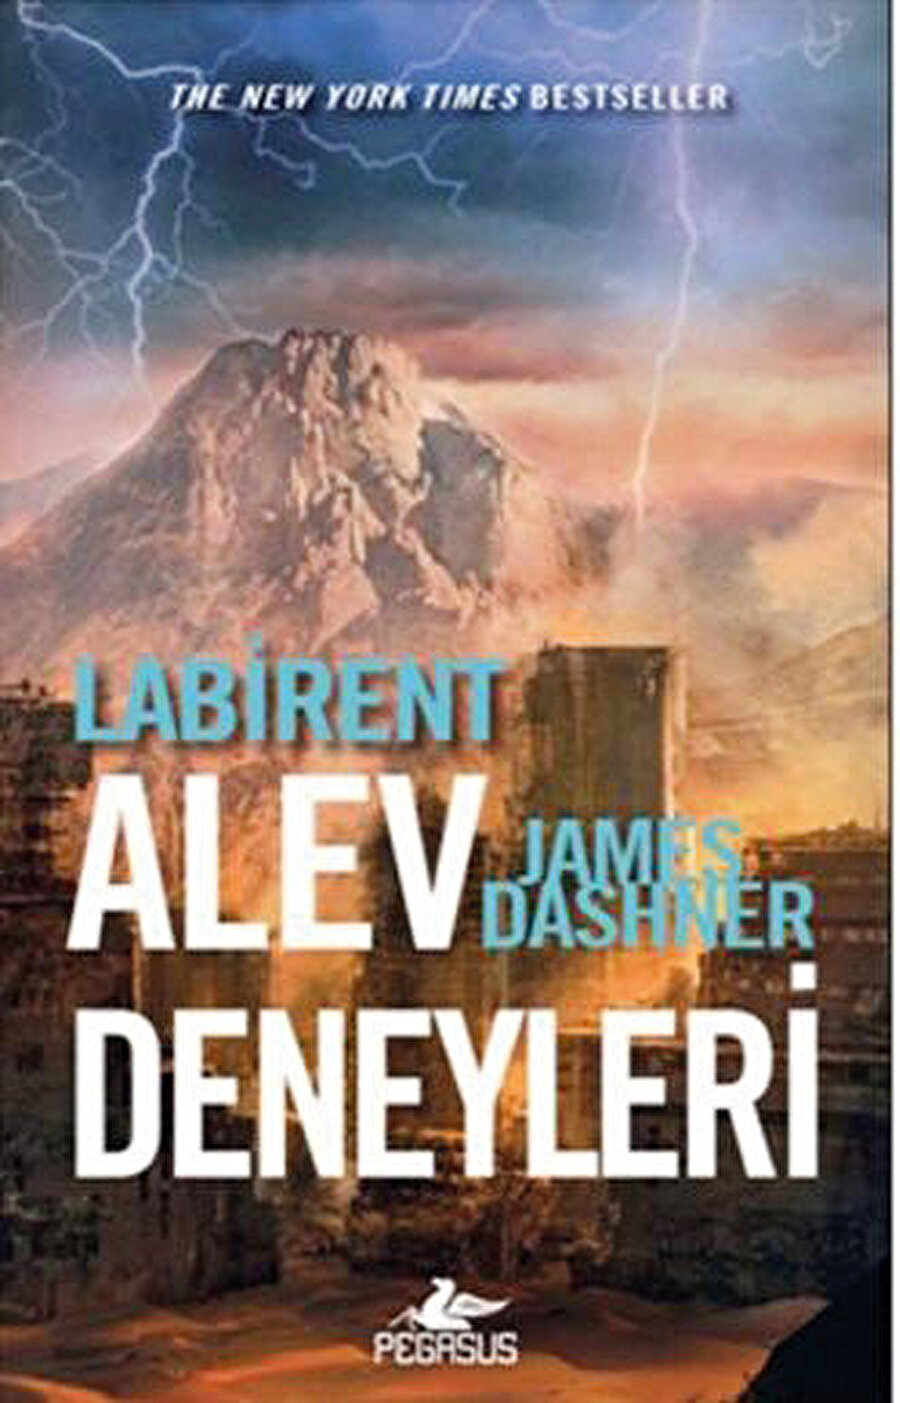 James Dashner, Alev Deneyleri